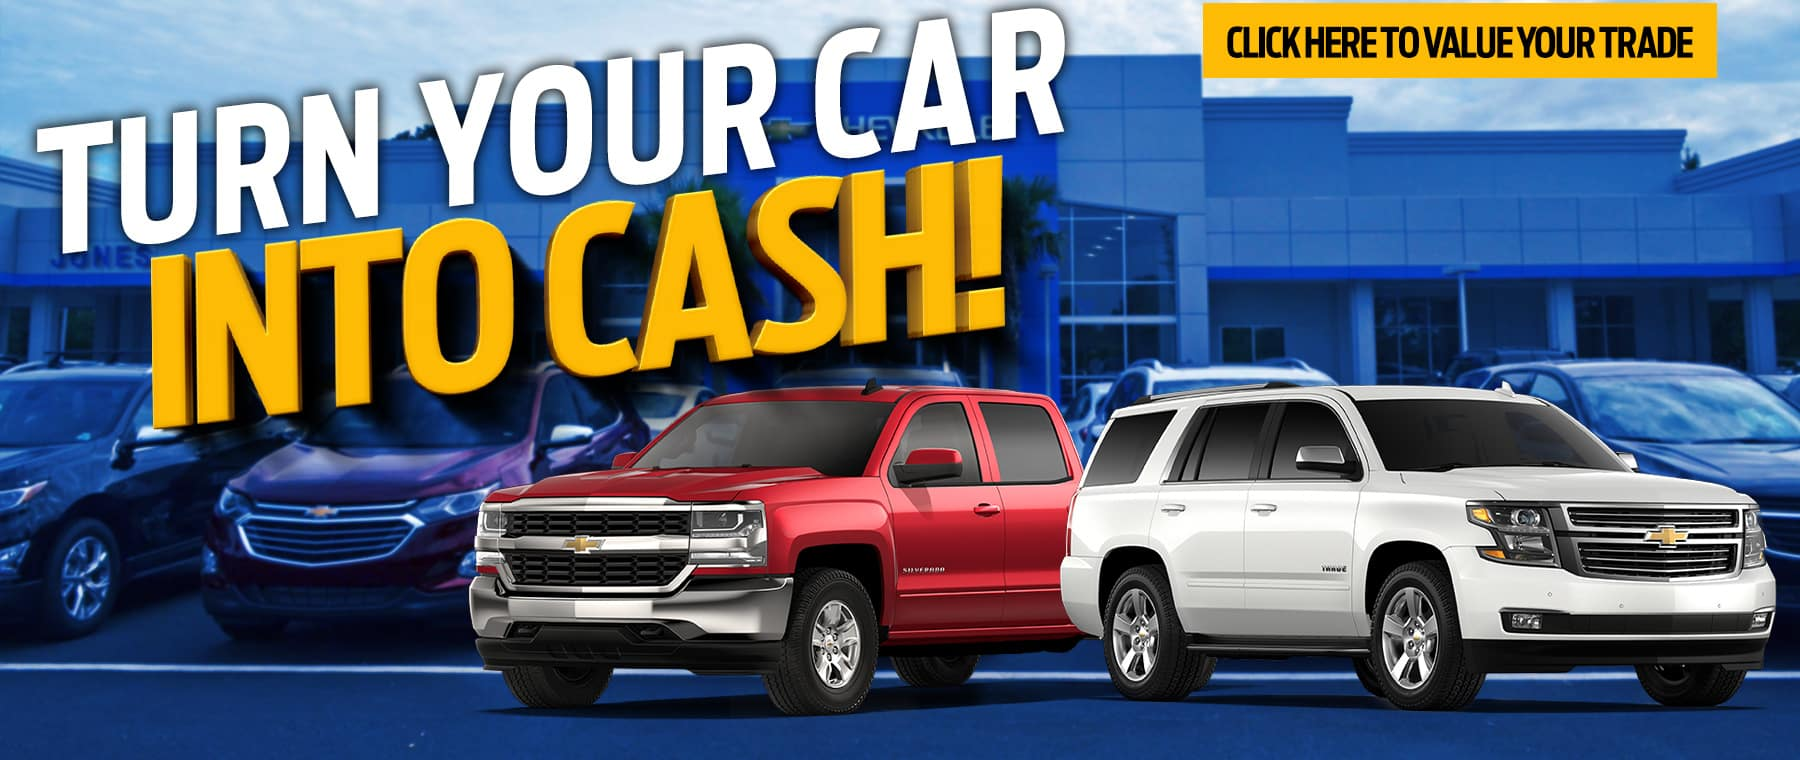 JOCH86426-01-Cars-To-Cash-Slide2